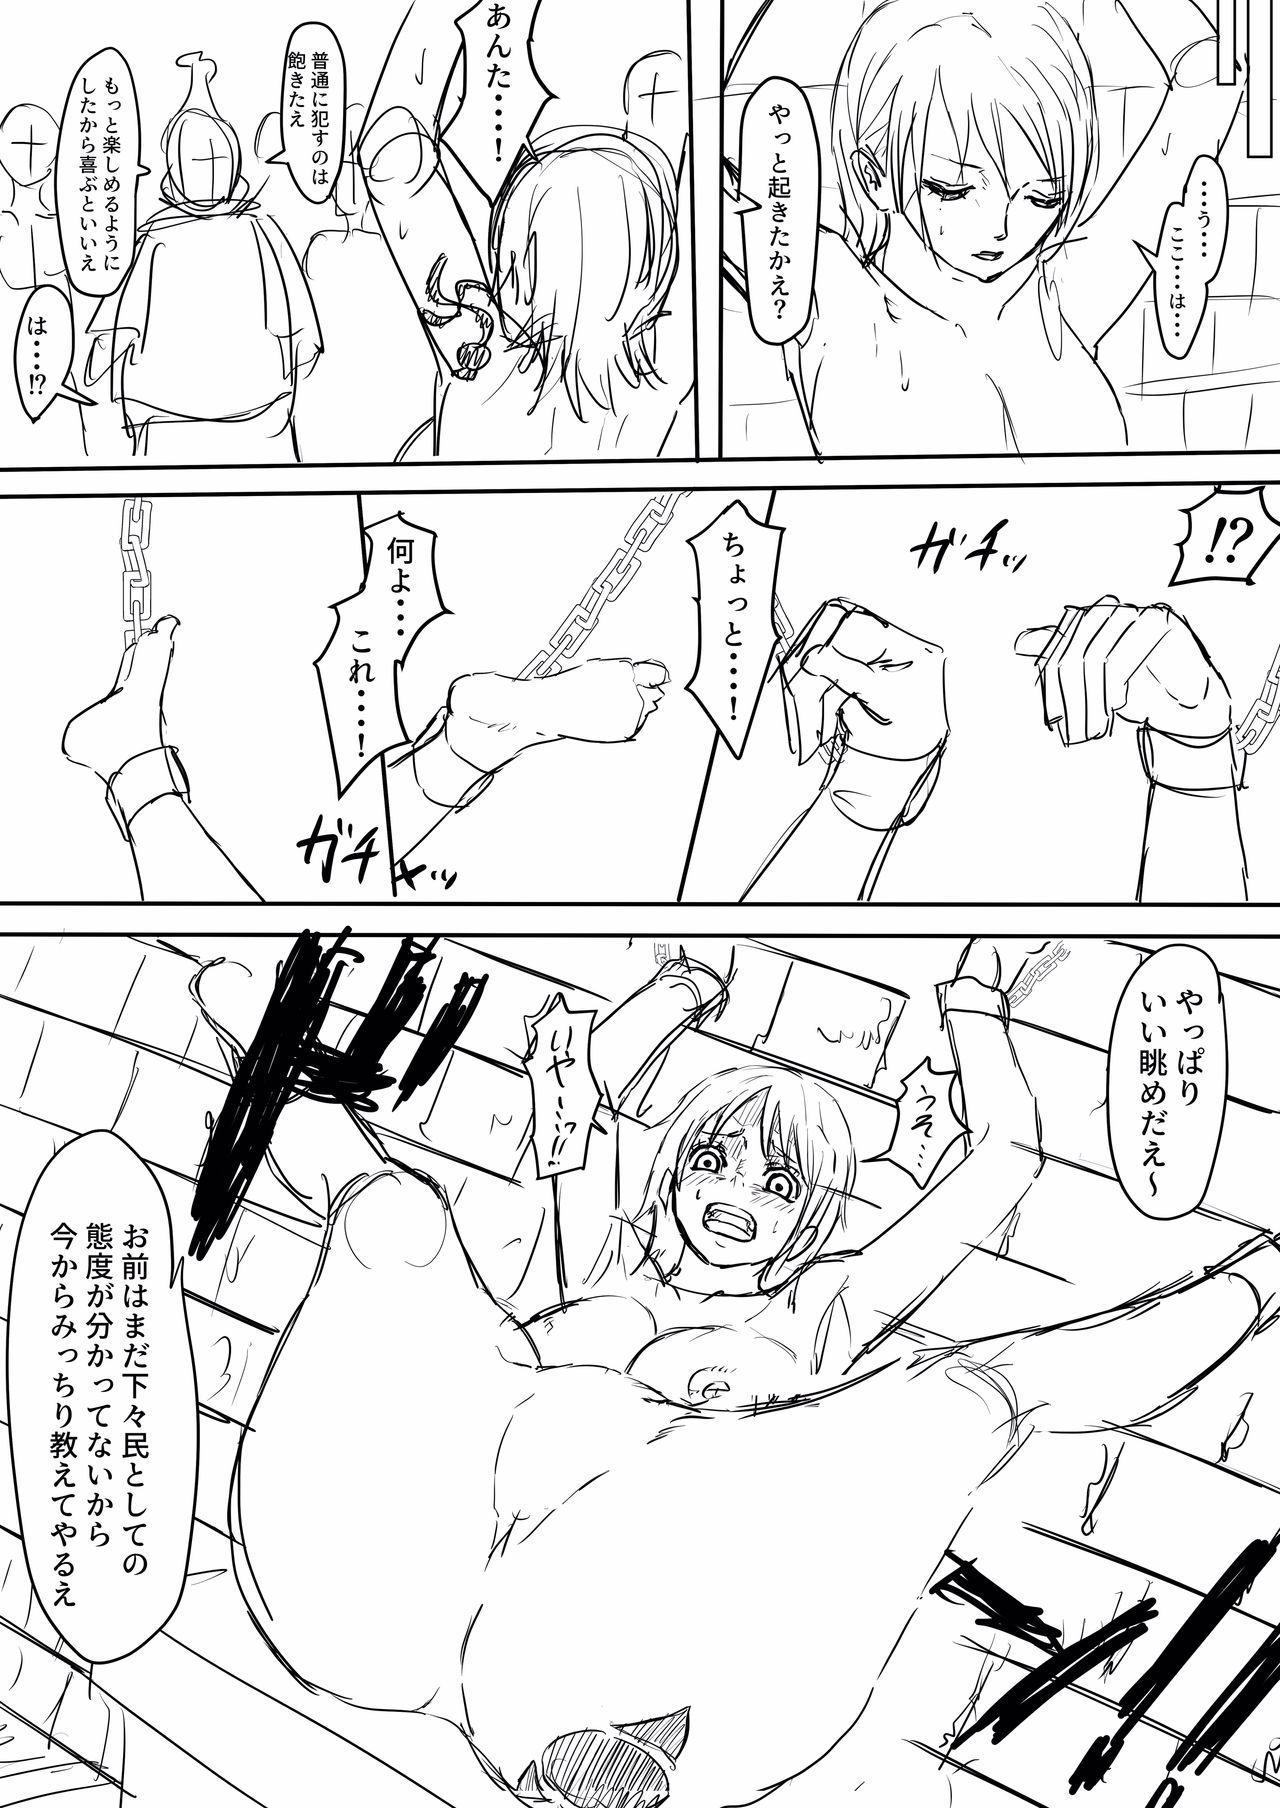 [Iwao] Nami H Manga (One Piece) Updated 6